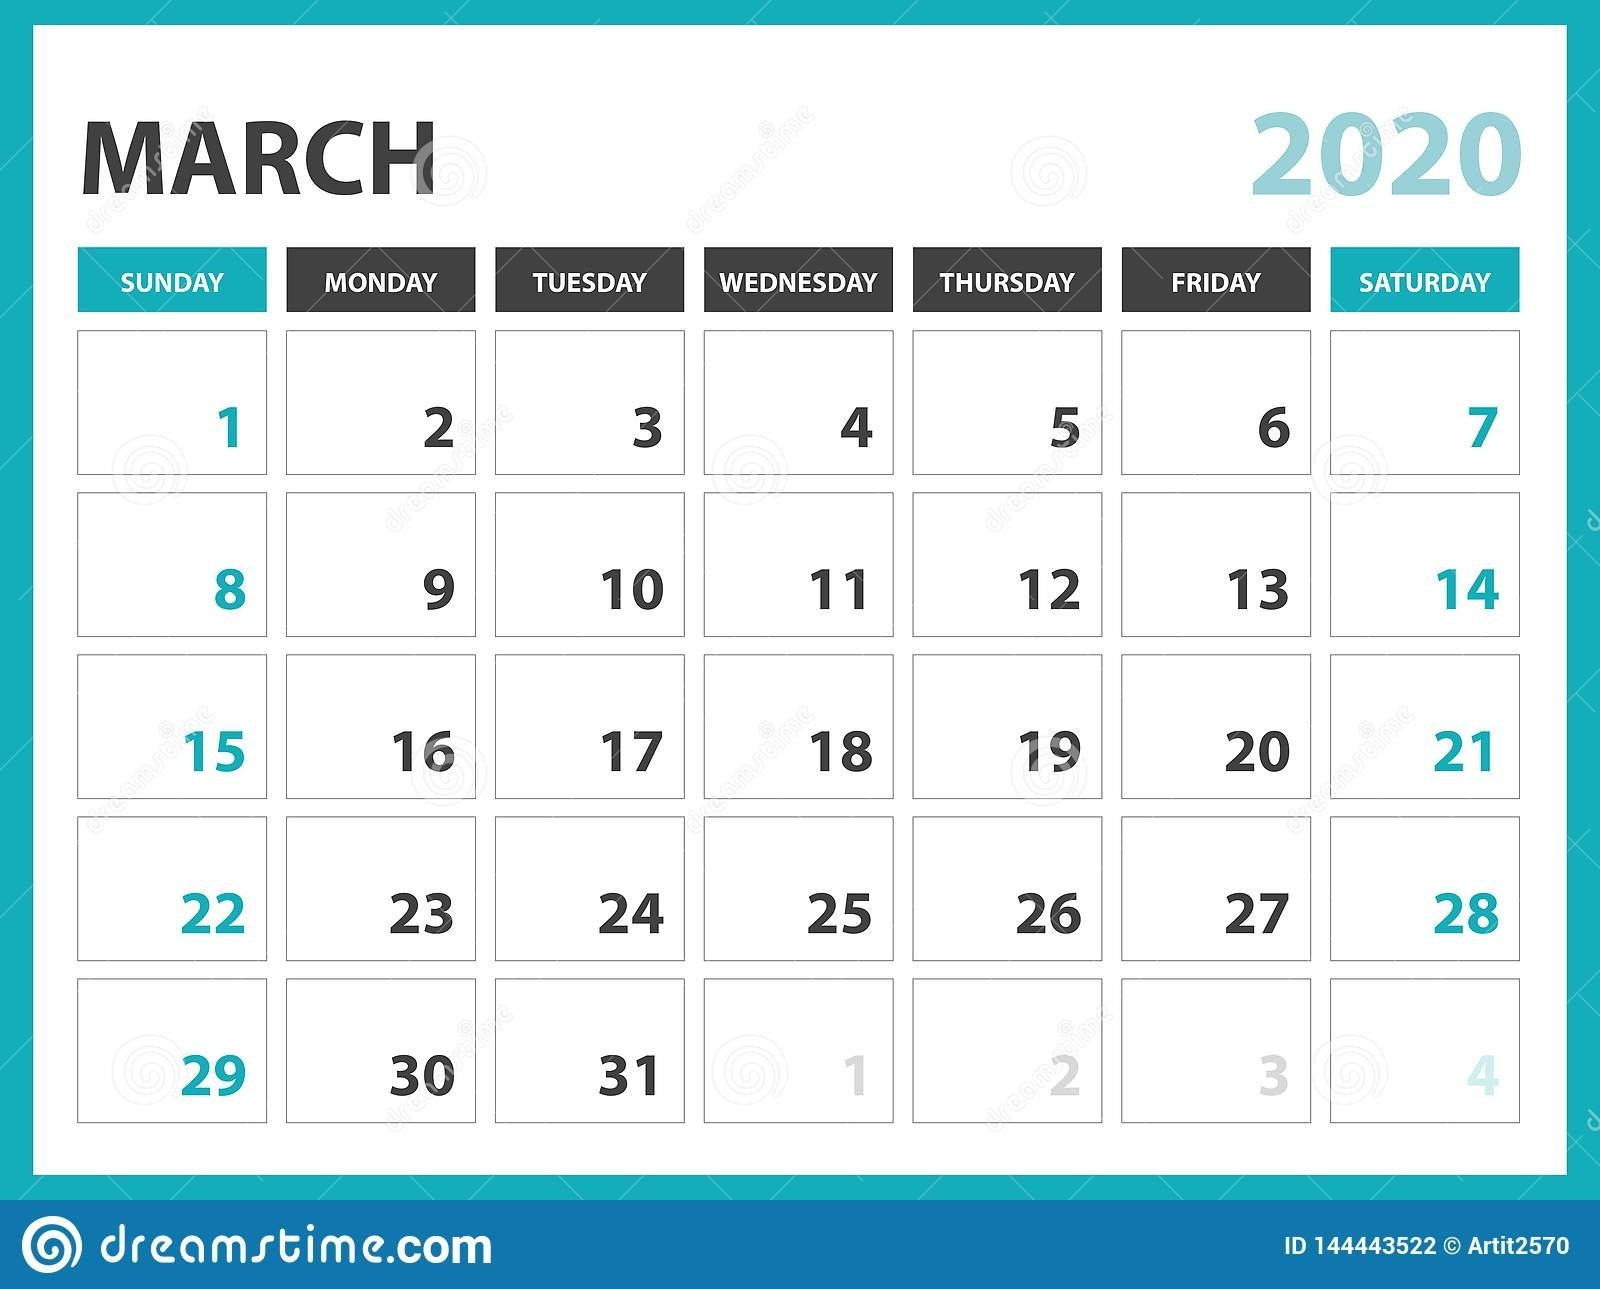 Desk Calendar Layout Size 8 X 6 Inch, March 2020 Calendar-8 X 10 Prinable Blank Monthly Calendar